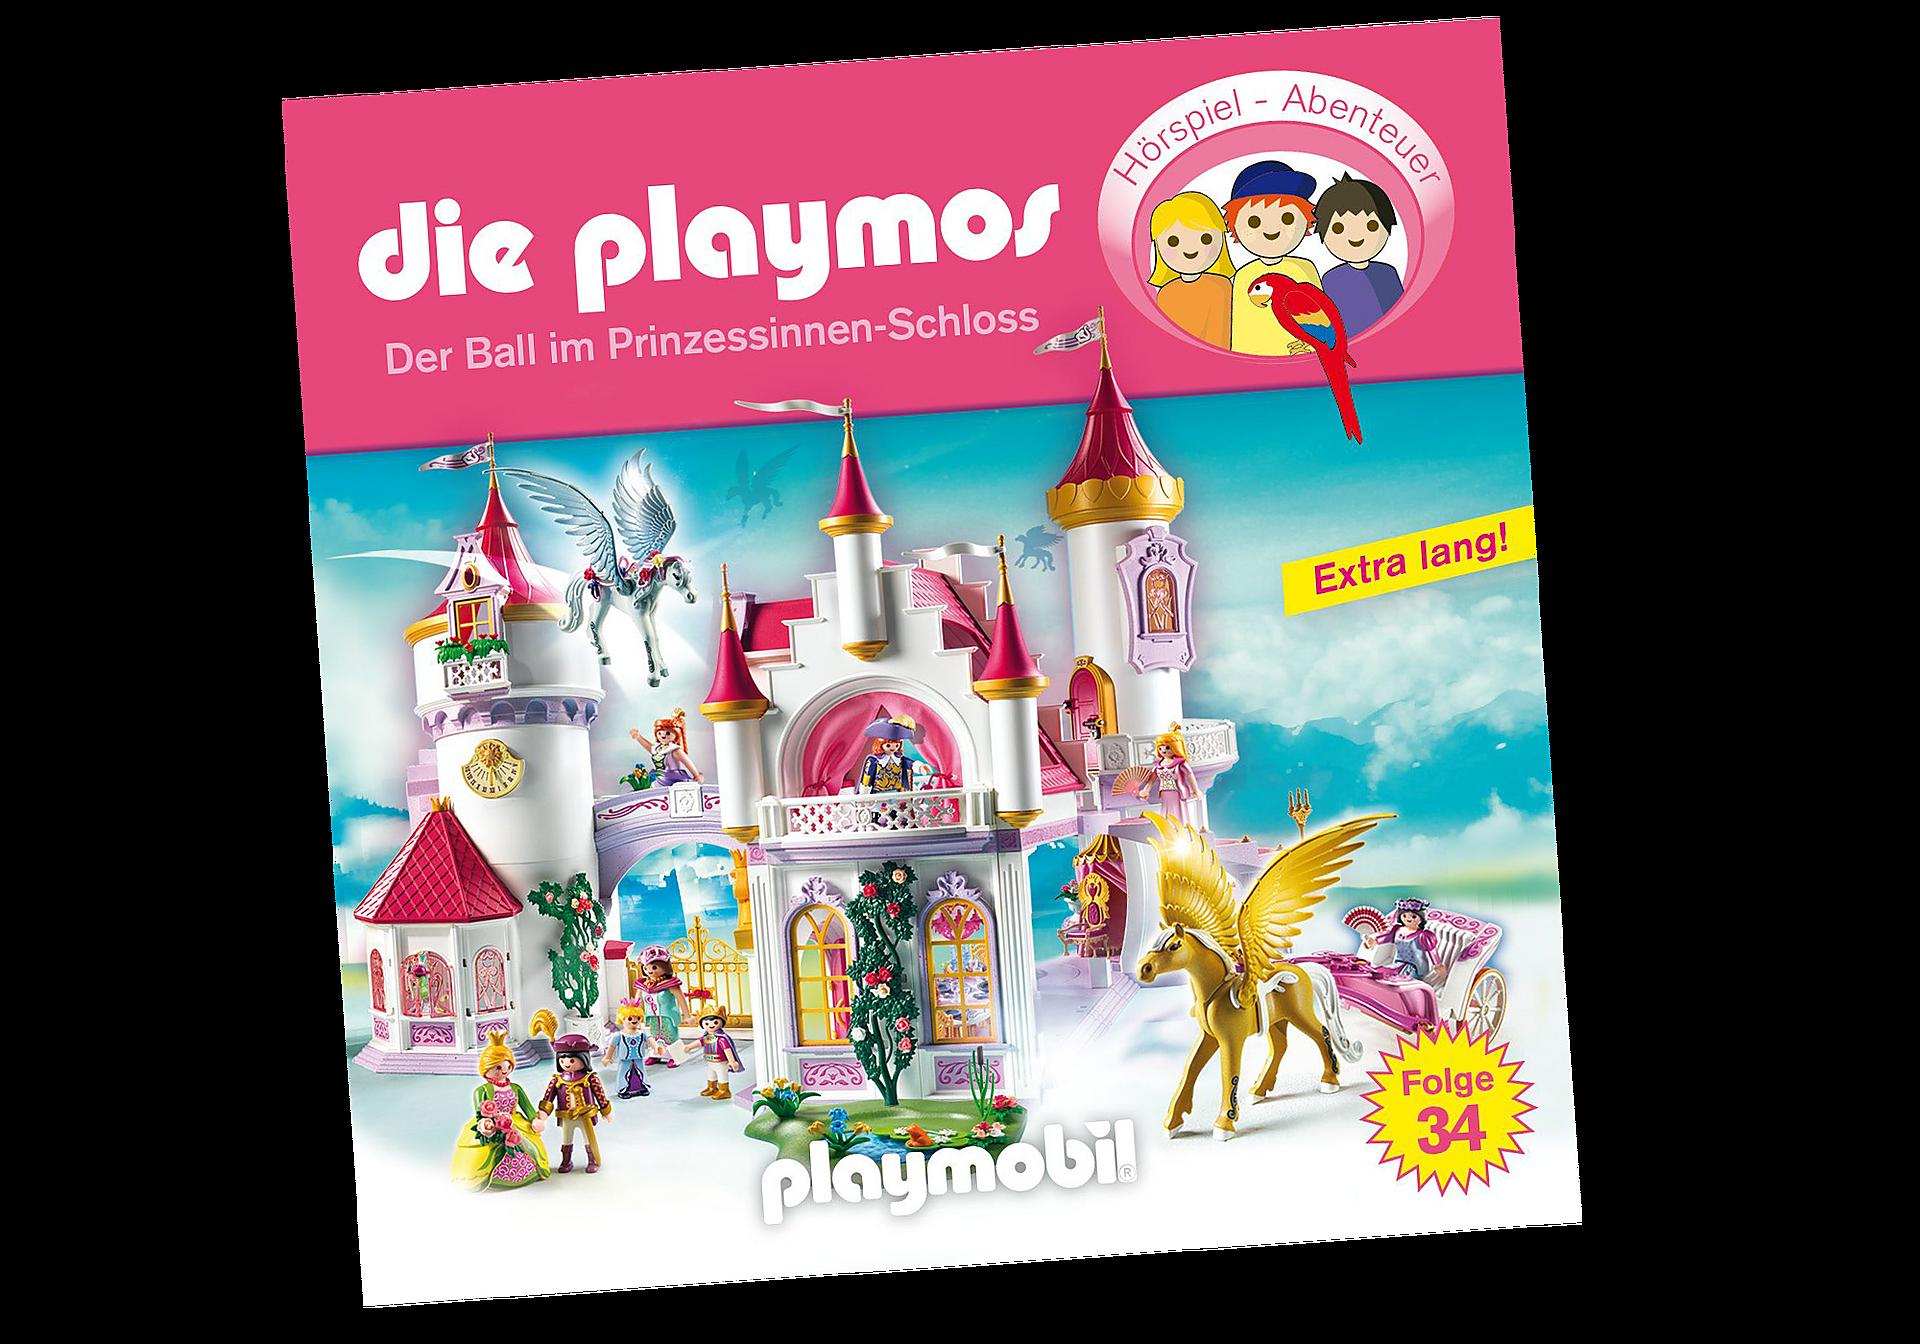 http://media.playmobil.com/i/playmobil/80445_product_detail/Der Ball im Prinzessinnenschloss (34) - CD